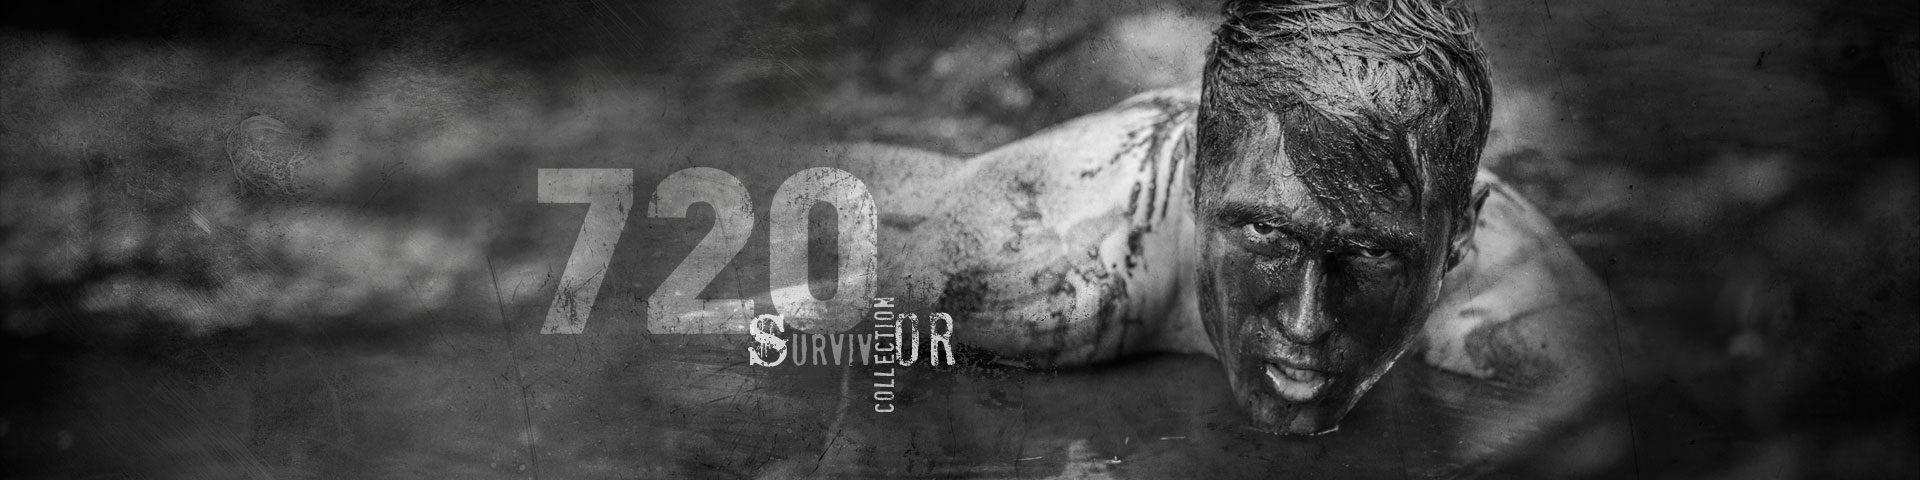 720_pic_survivor